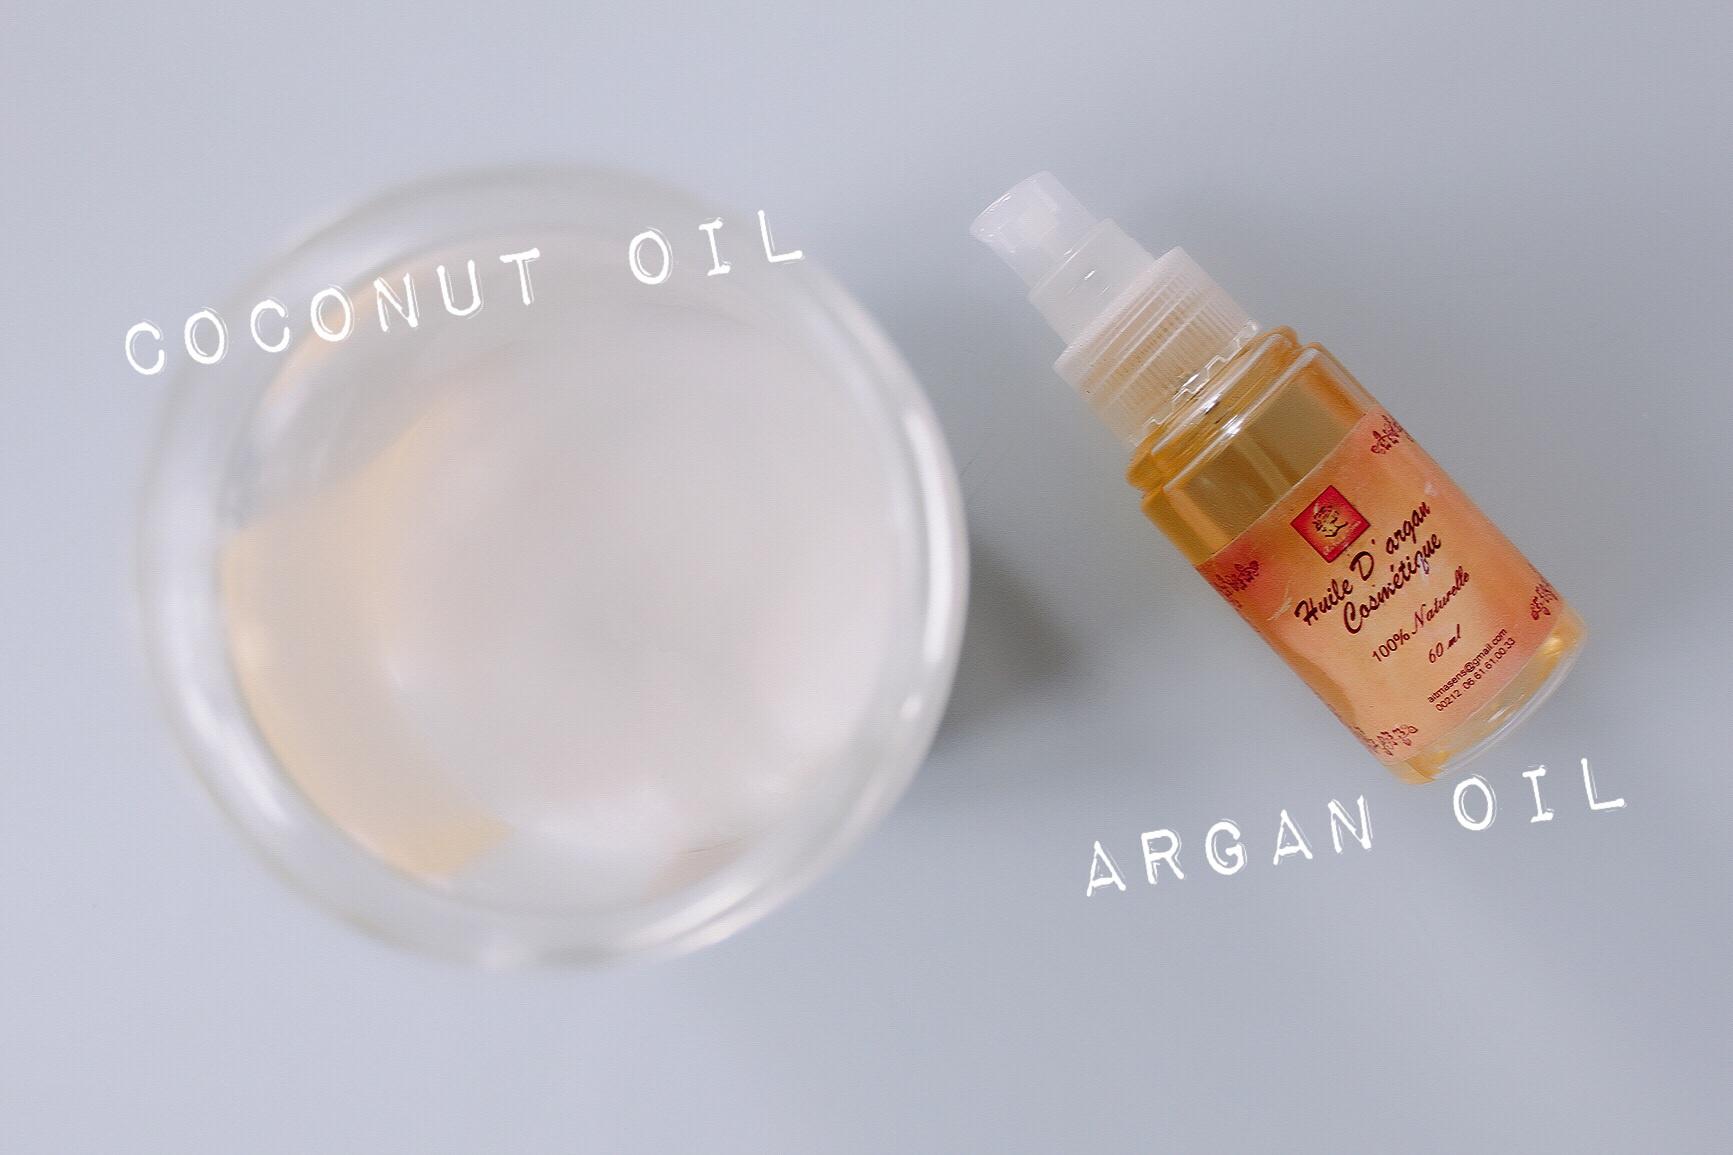 Argan oil coconut oil